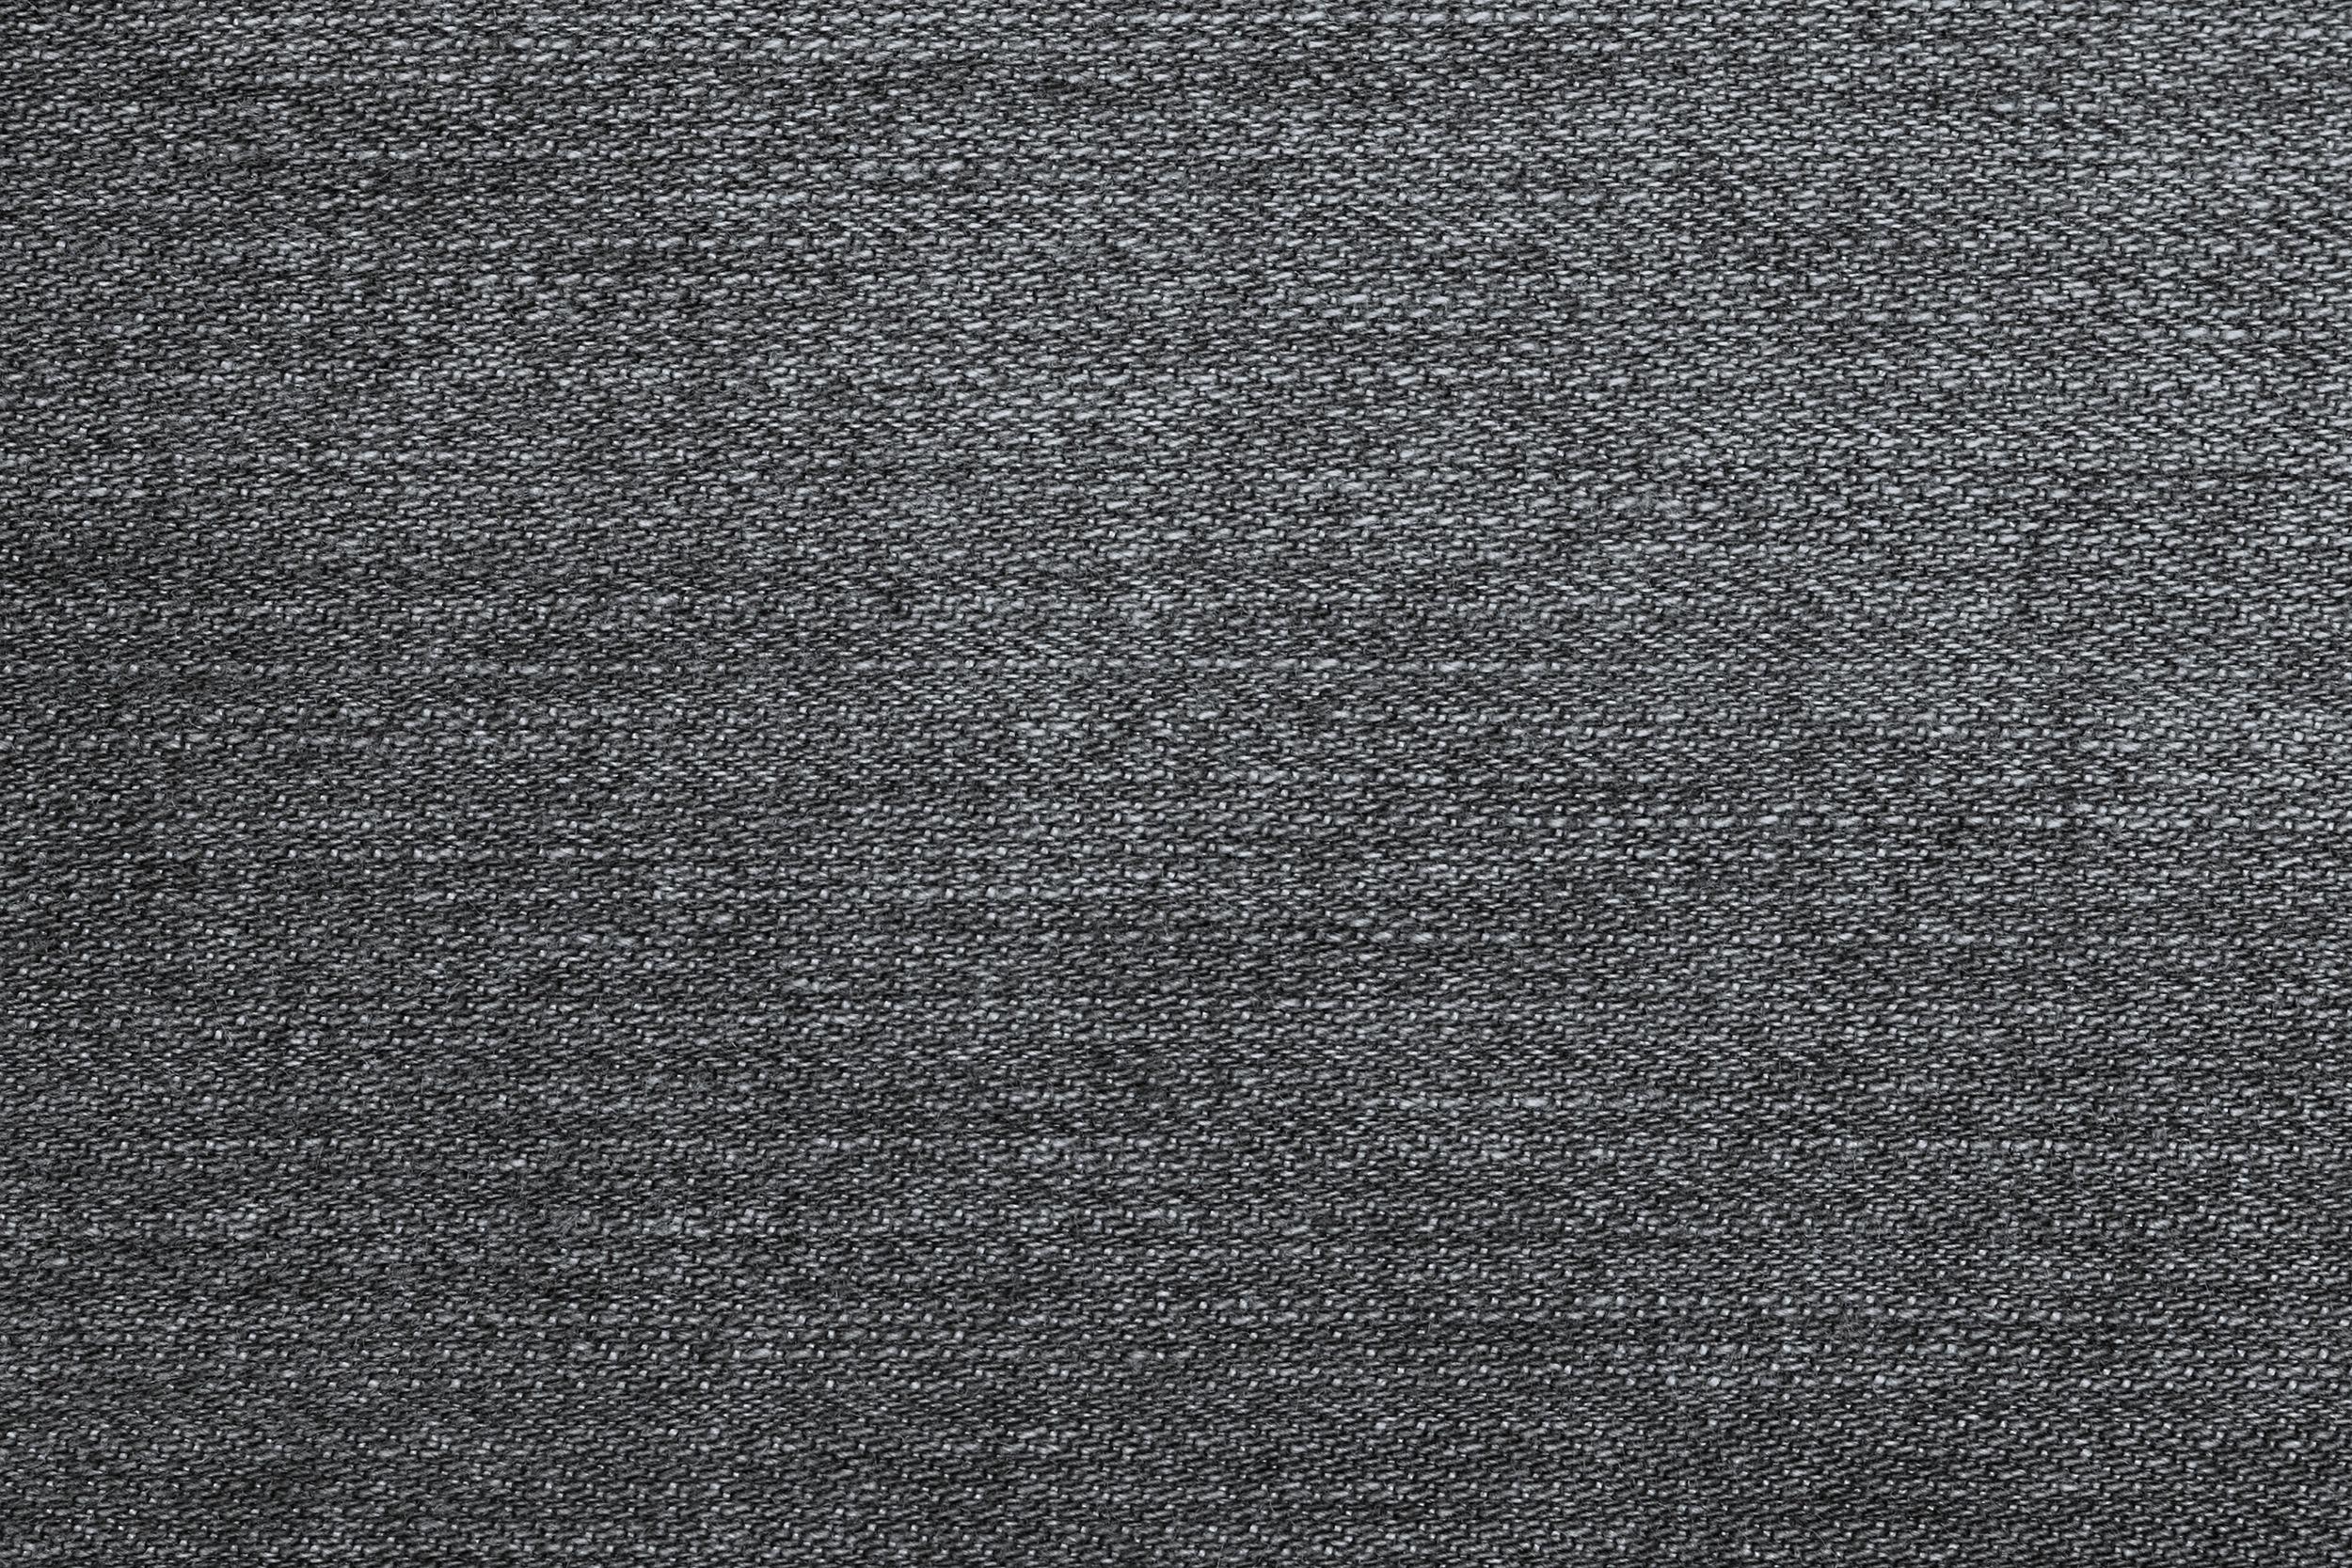 free images leather vintage retro texture floor asphalt rh pxhere com